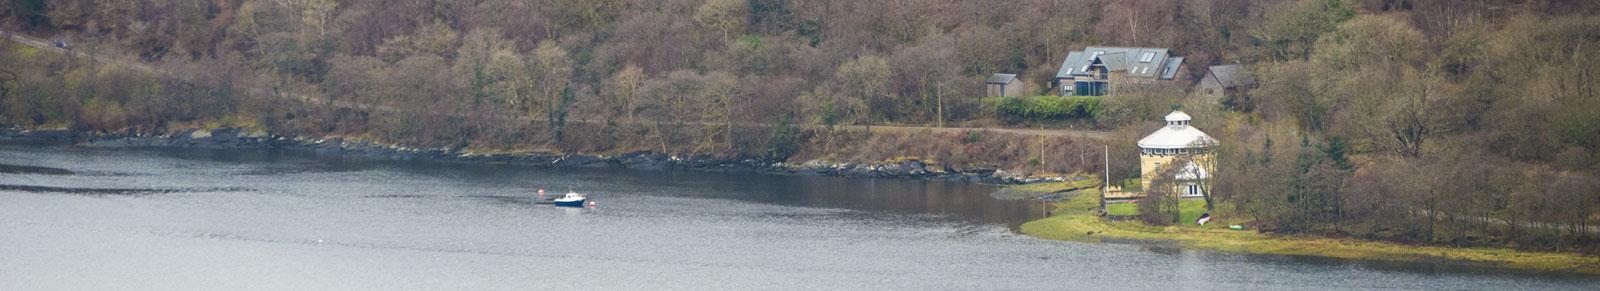 Loch Creran view